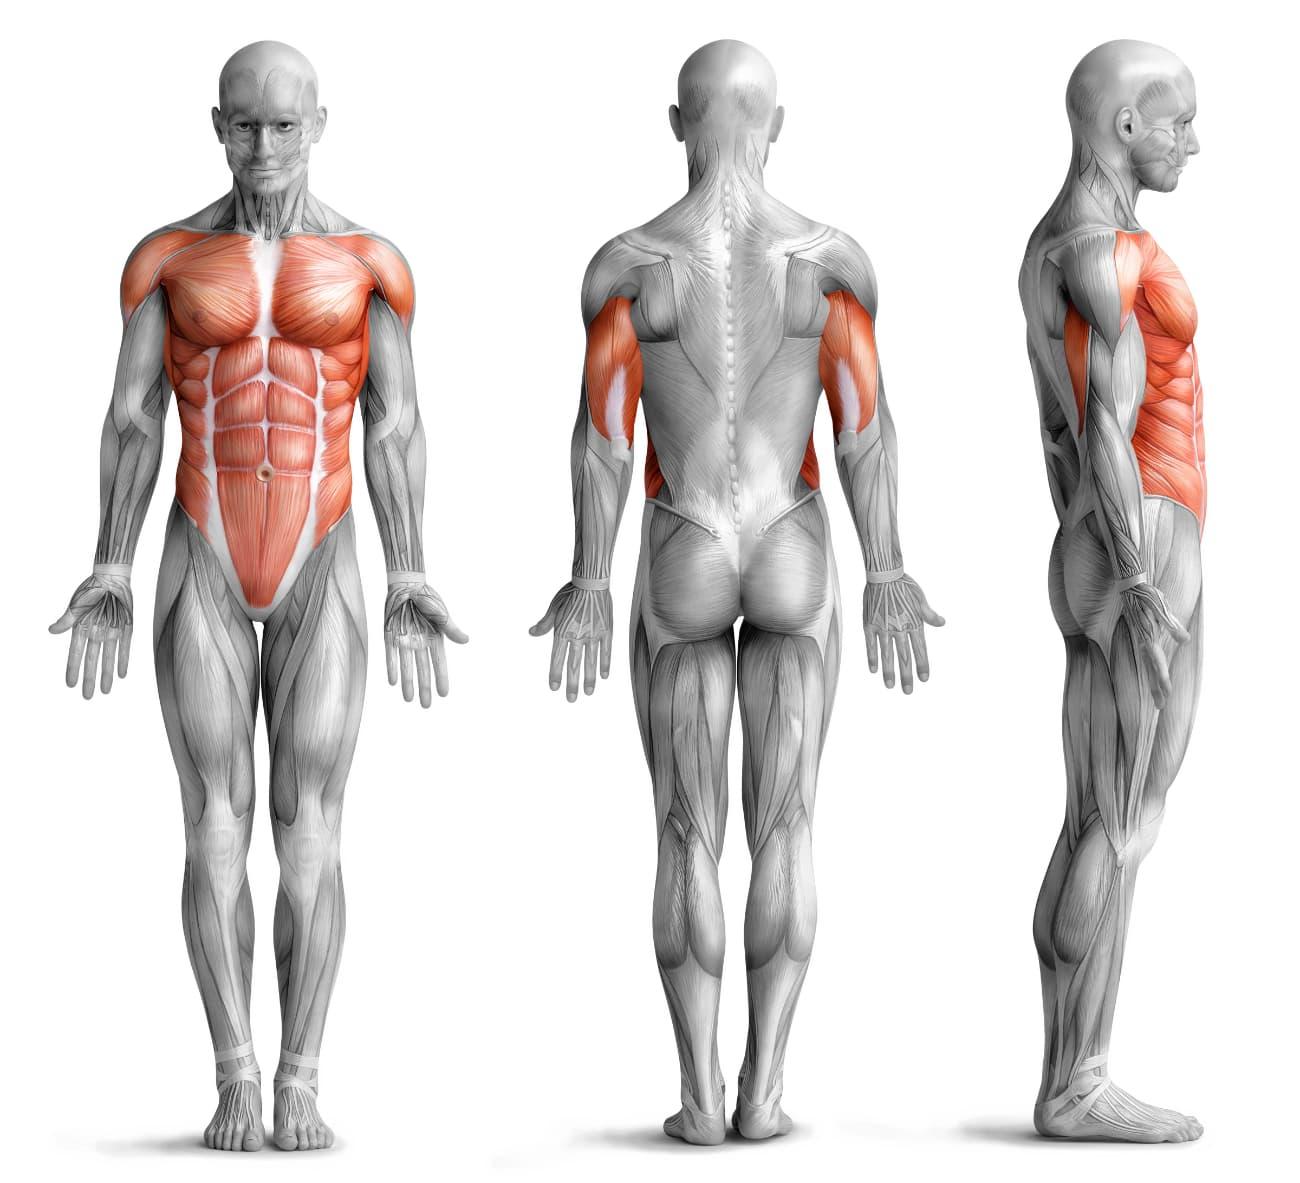 Liegestütze beanspruchte Muskulatur